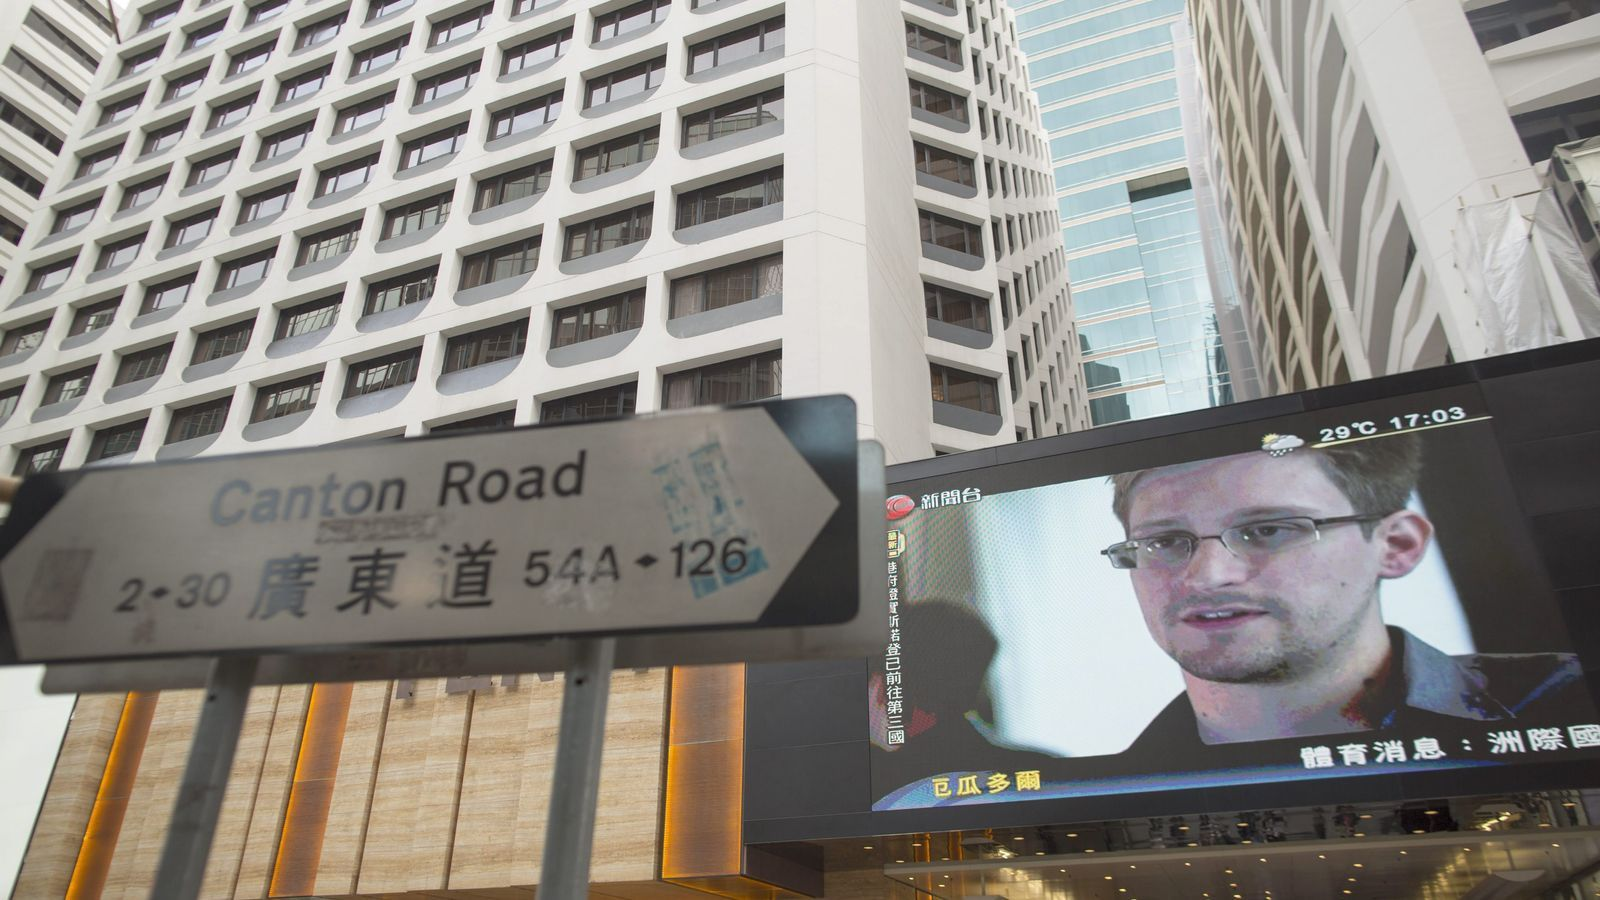 L'efígie d'Edward Snowden, omnipresent en les últimes setmanes a Hong Kong